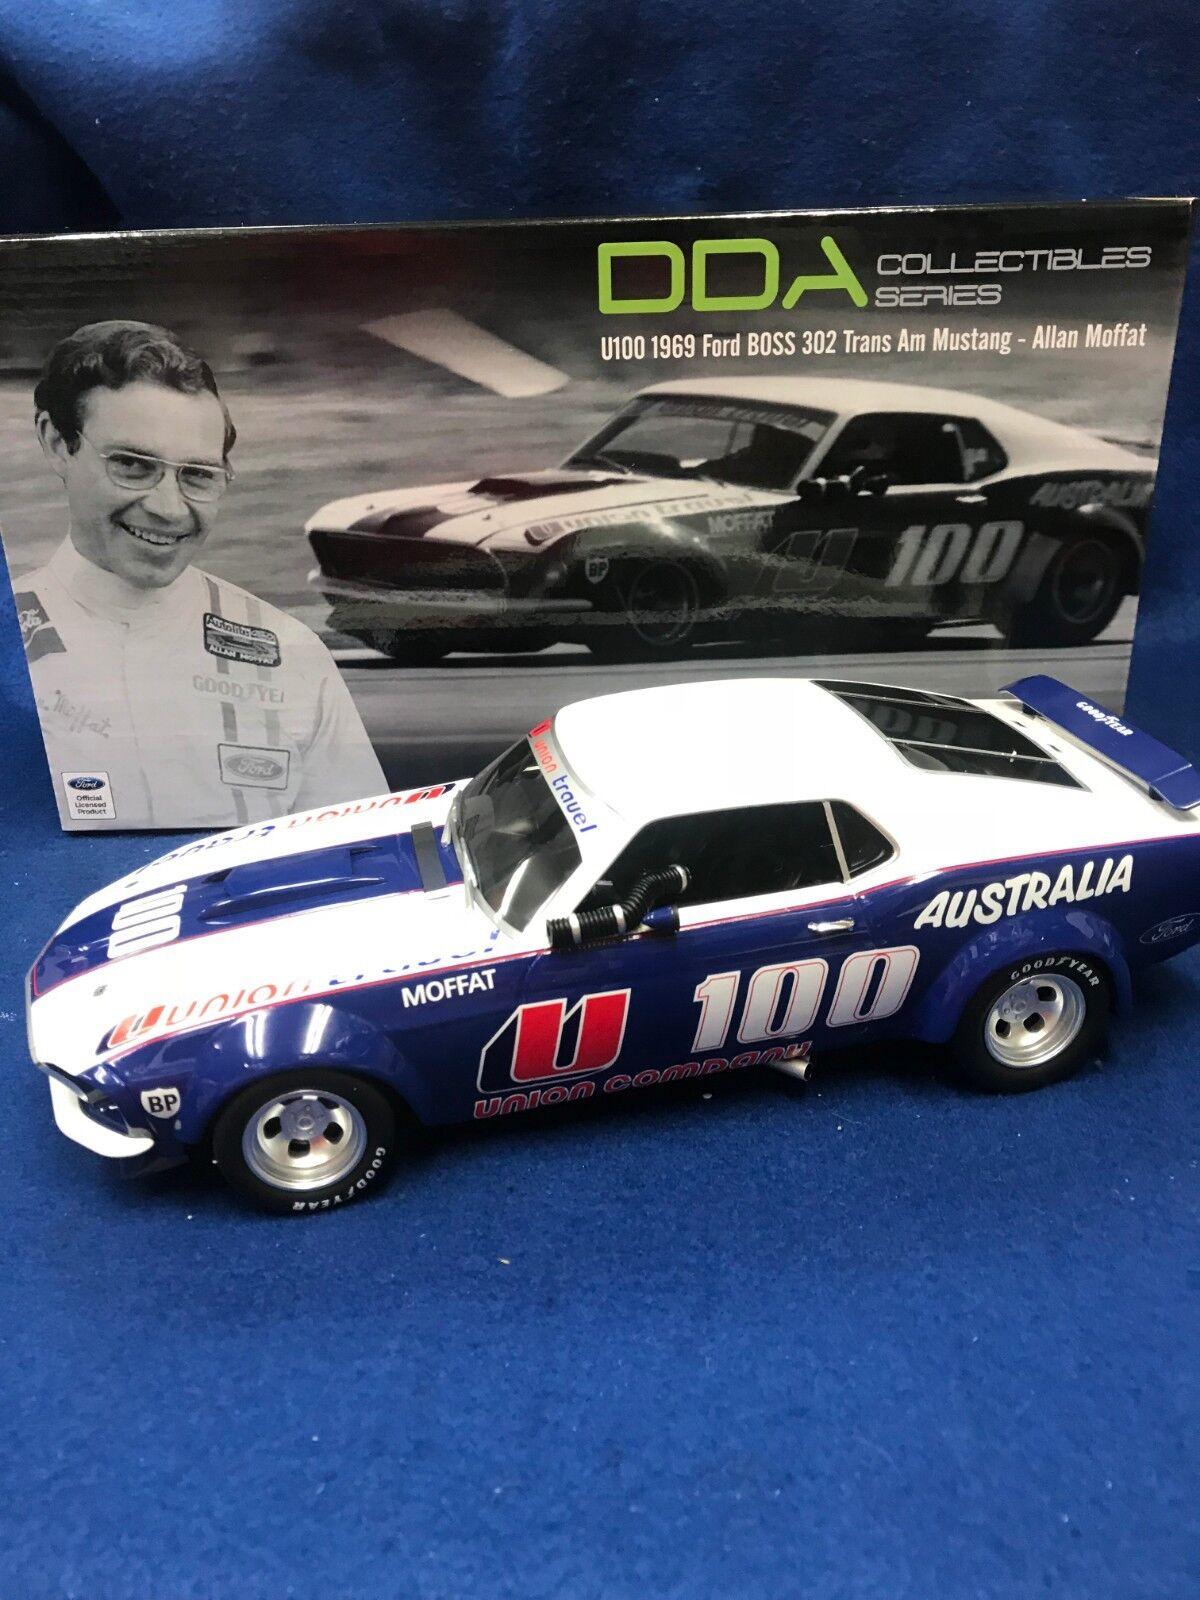 1 18 Allan Moffat Racing  U100 1969 Ford Boss 302 Trans Am Mustang RARDDA18003